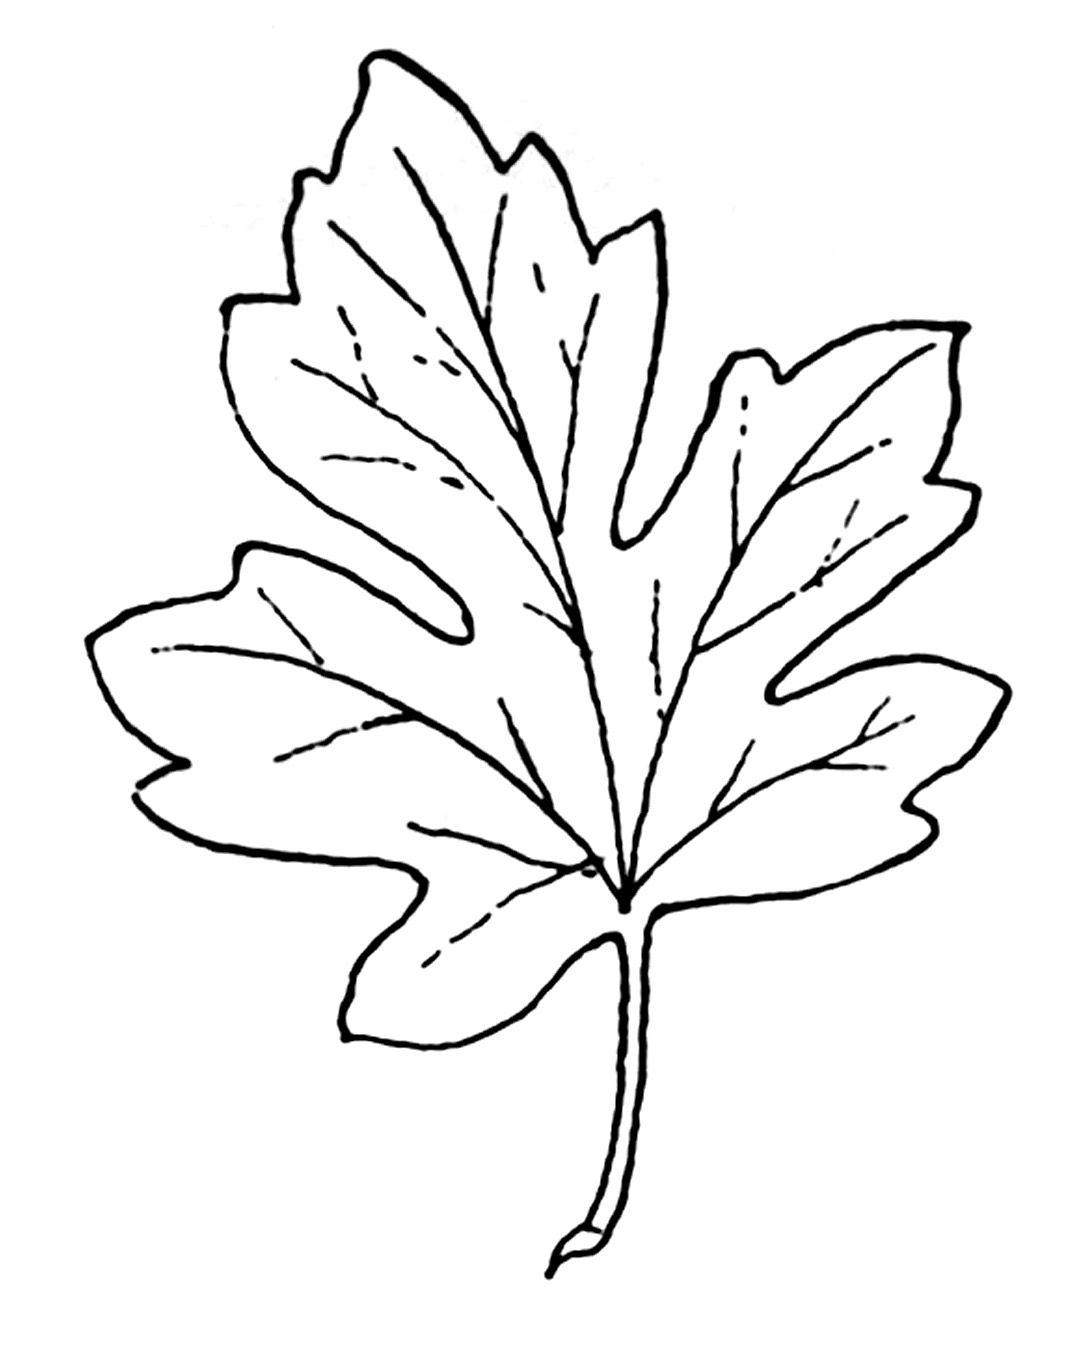 Vintage Fall Clip Art - Maple Leaves | Craft Ideas | Pinterest ...